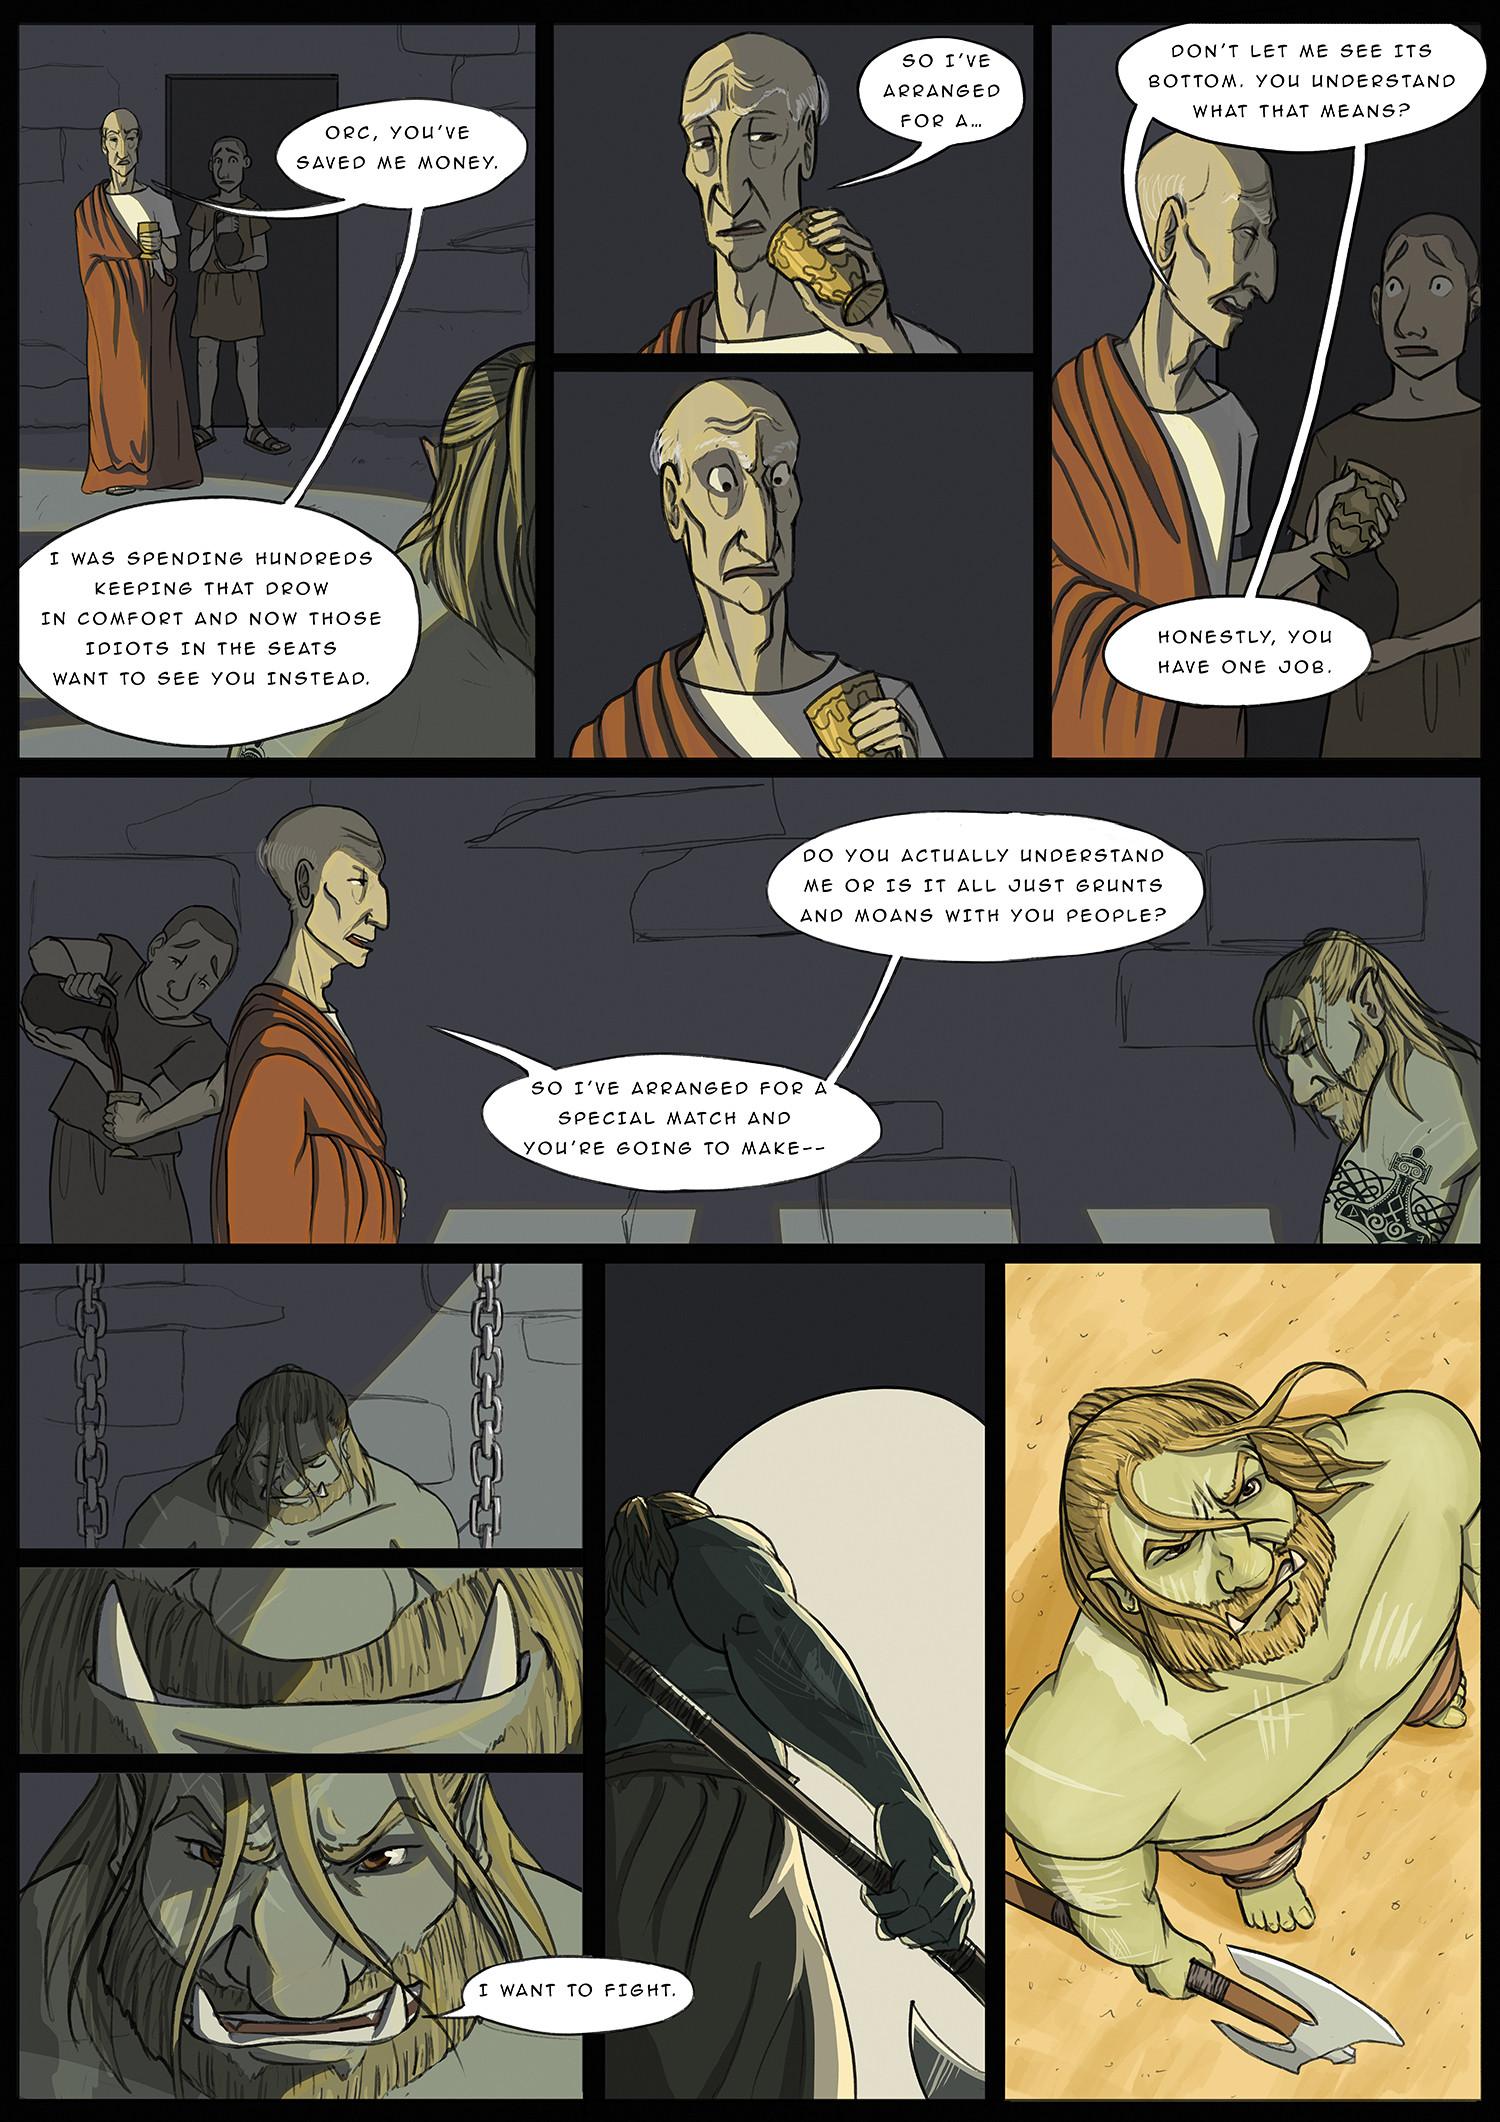 Jessica trevino page4